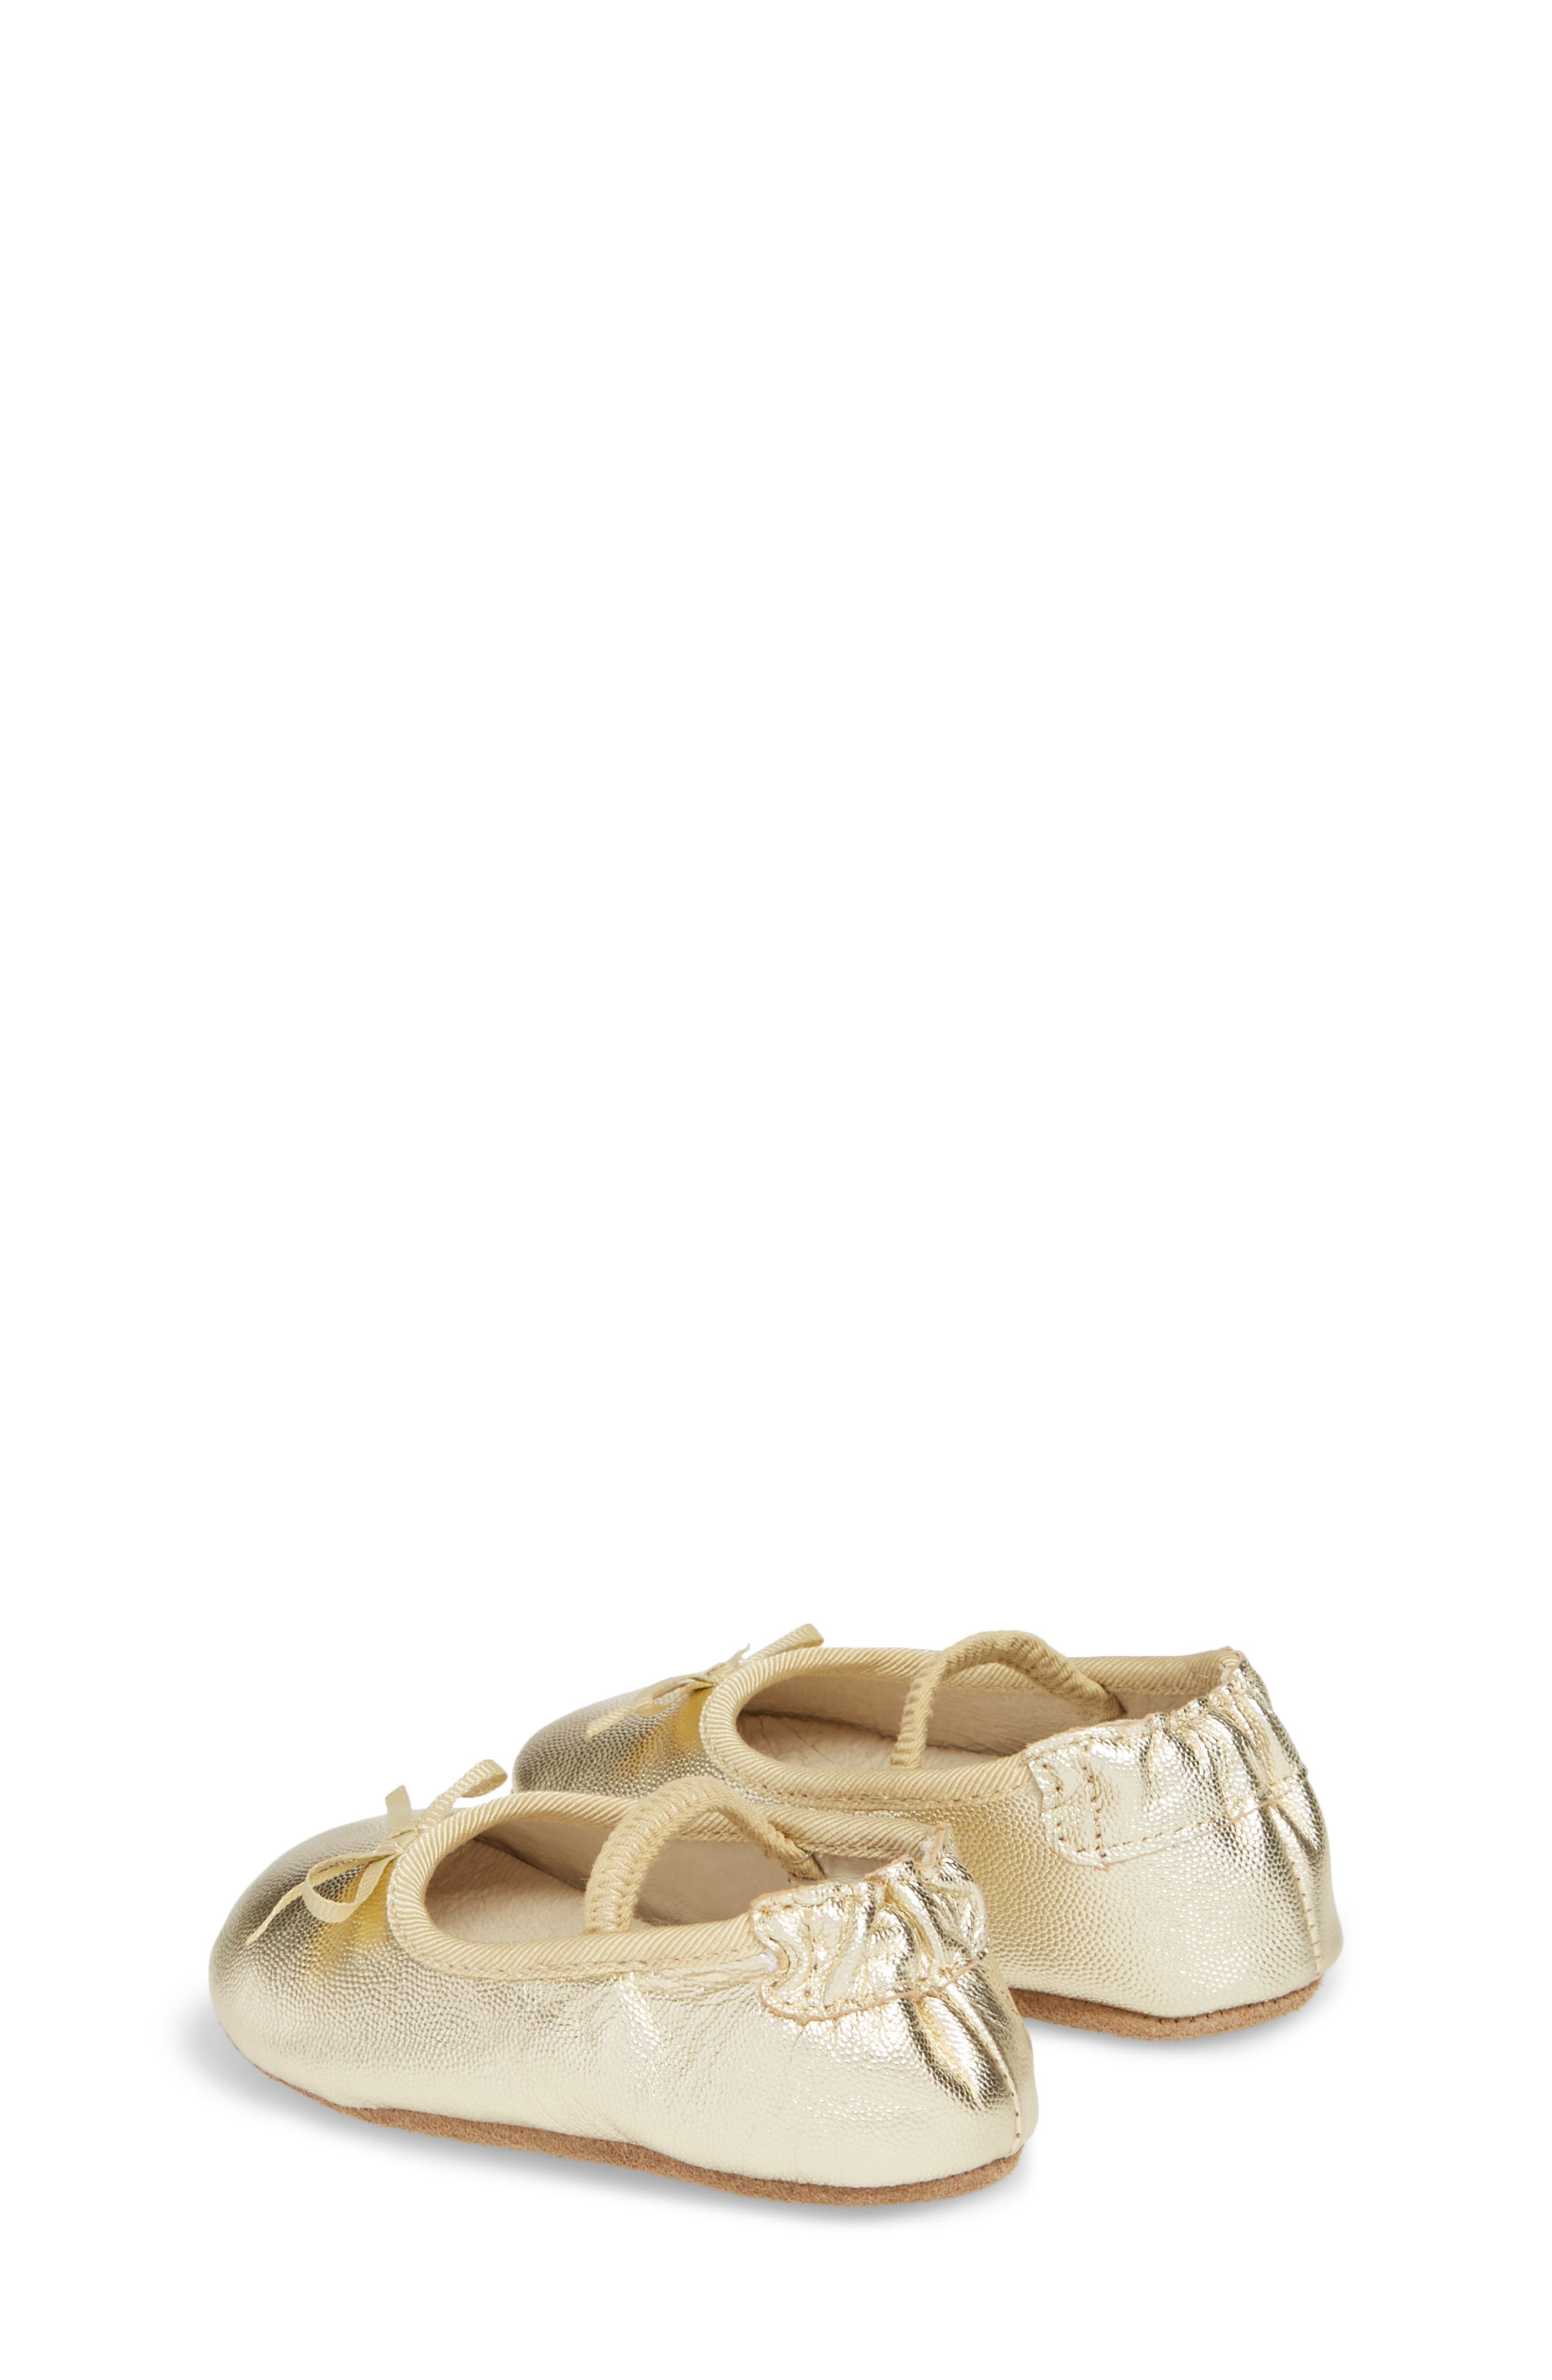 Athena Ballet Strap Crib Shoe,                             Alternate thumbnail 2, color,                             GOLD